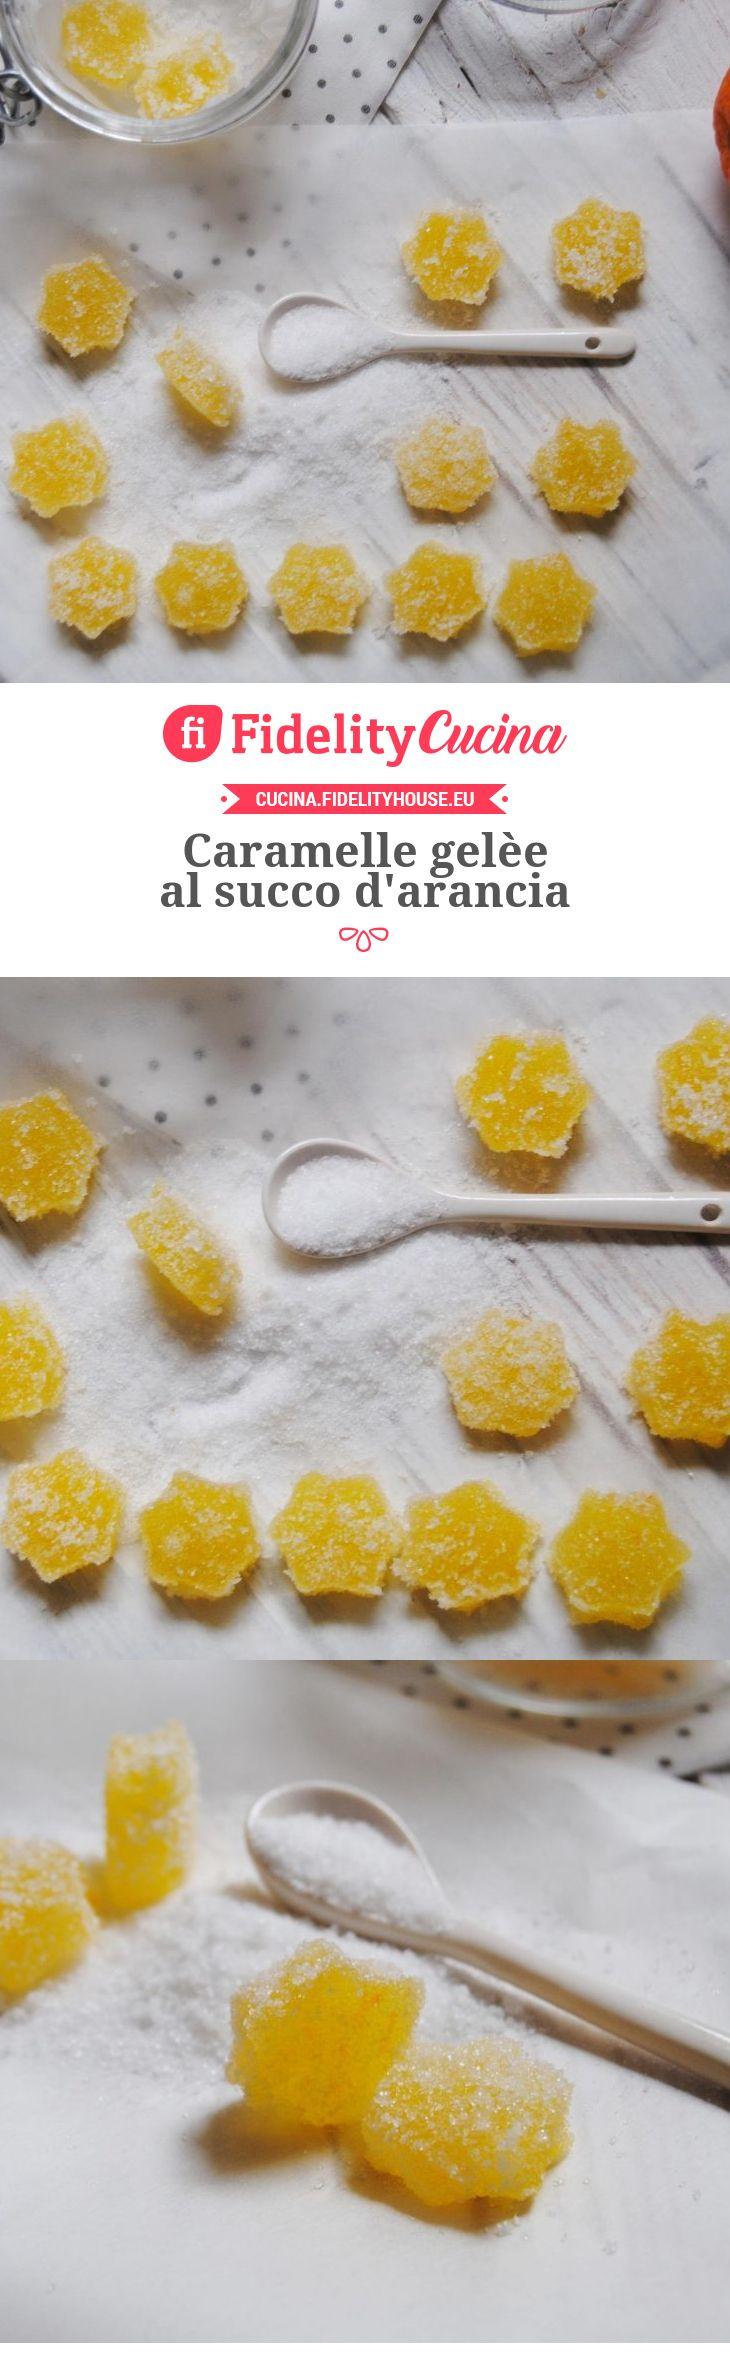 Caramelle gelèe al succo d'arancia